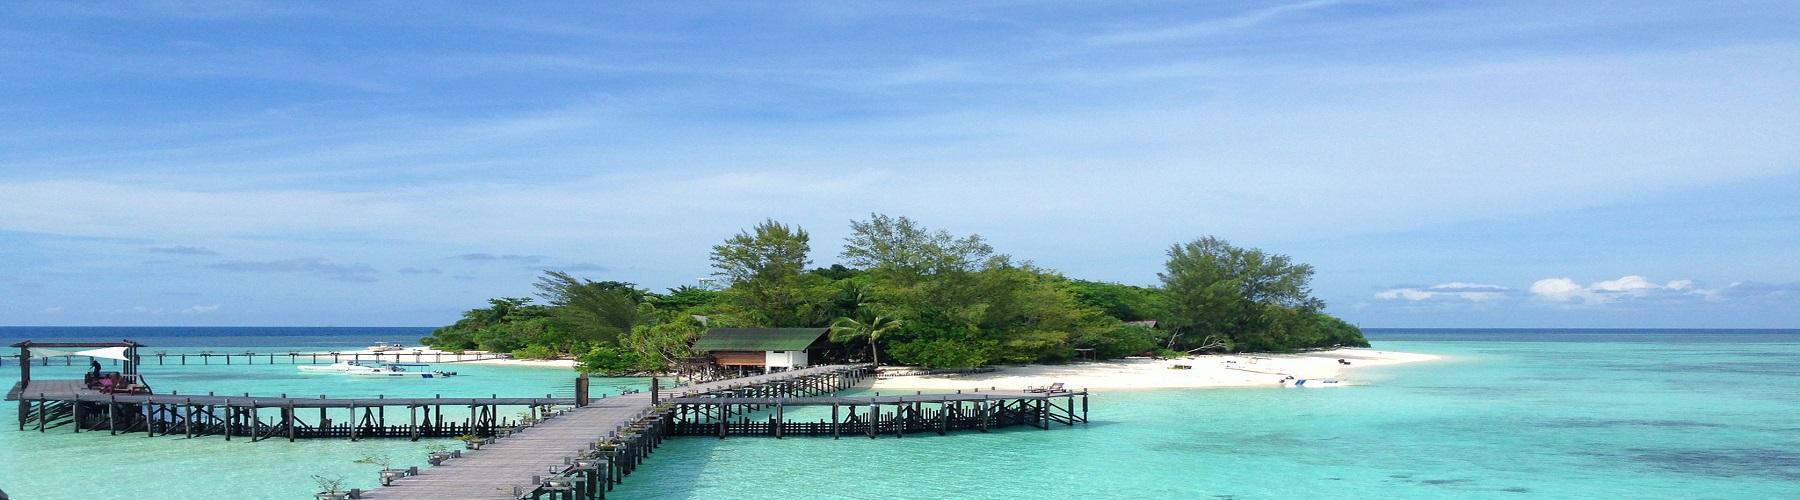 Отдых на острове Лаянг-Лаянг